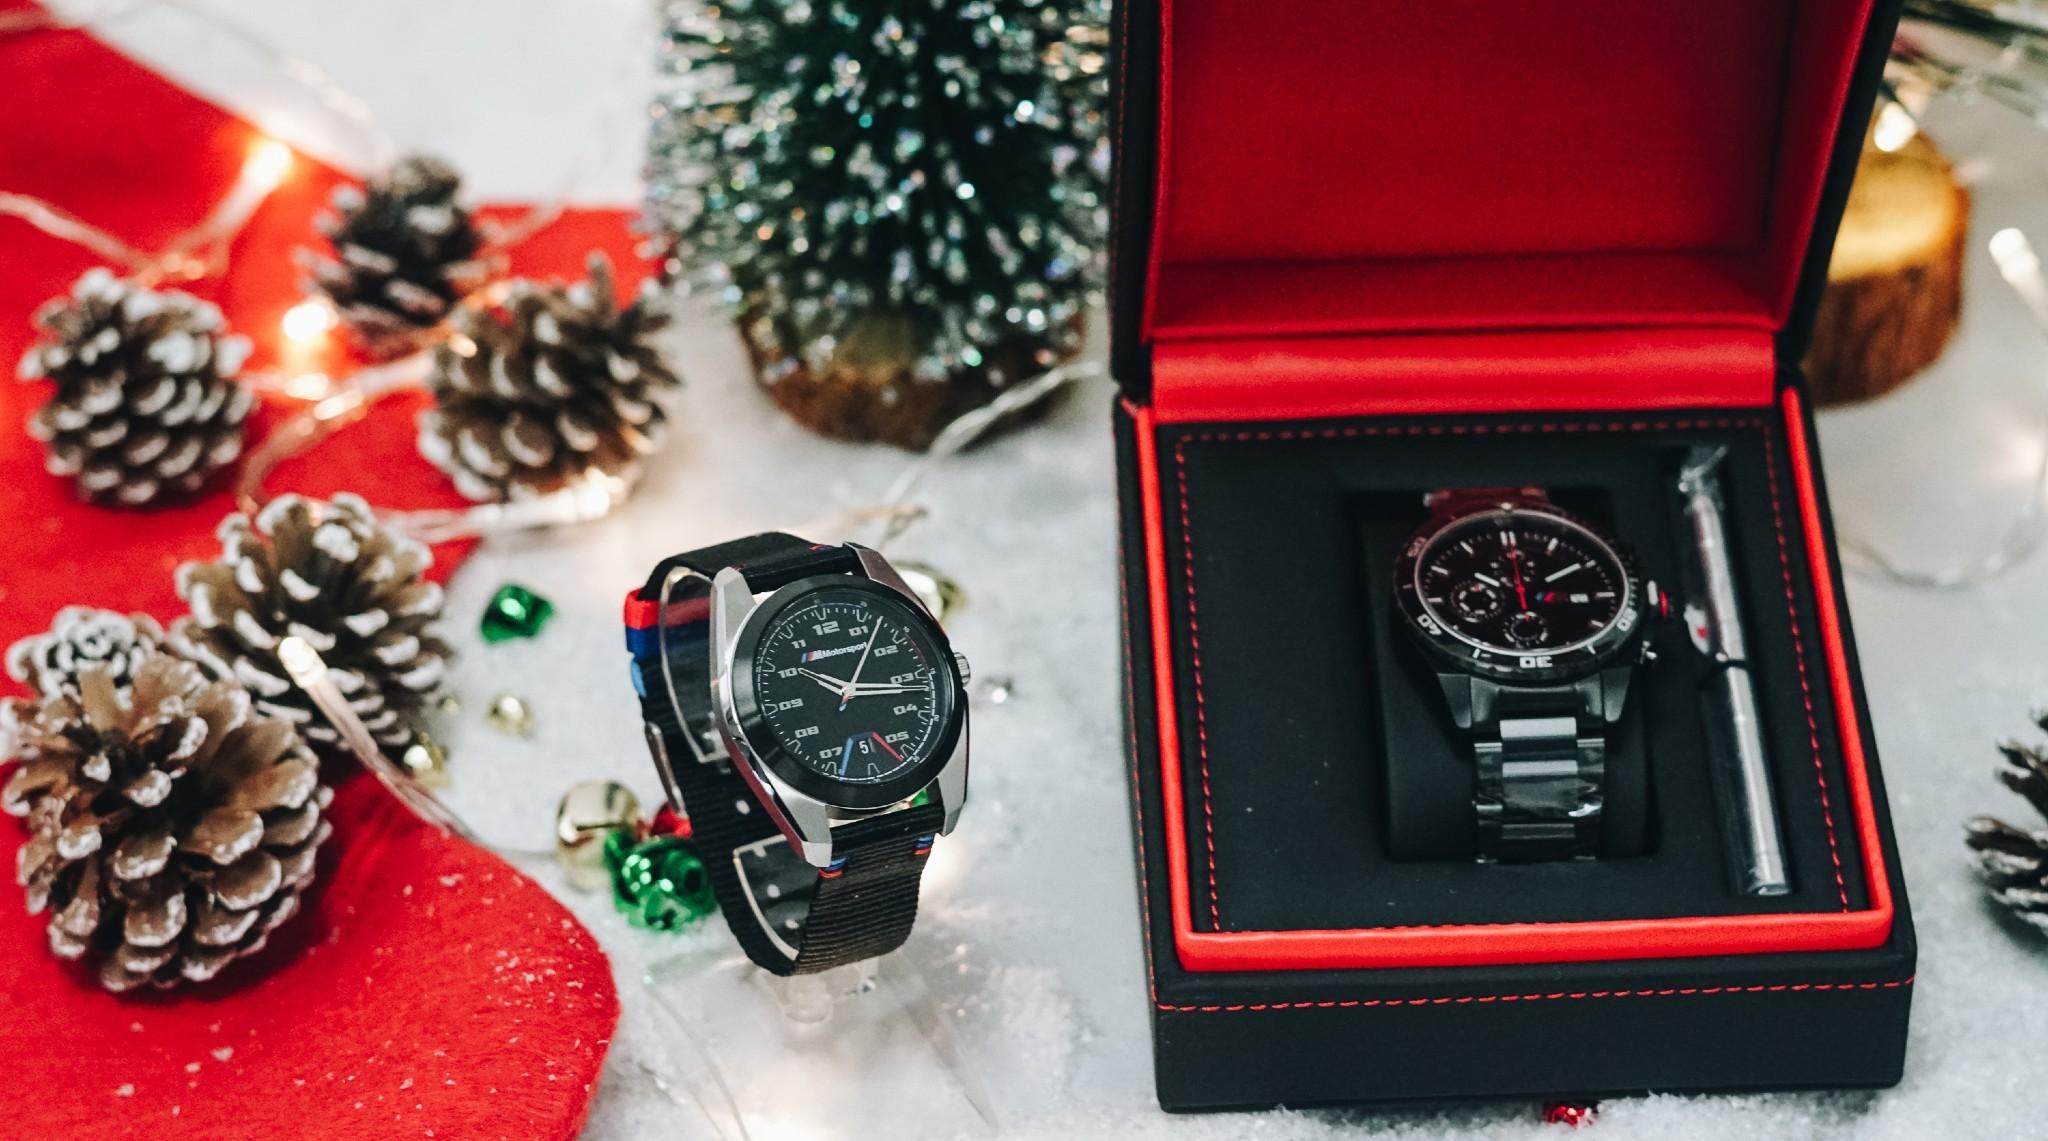 BMW M chronograph watch